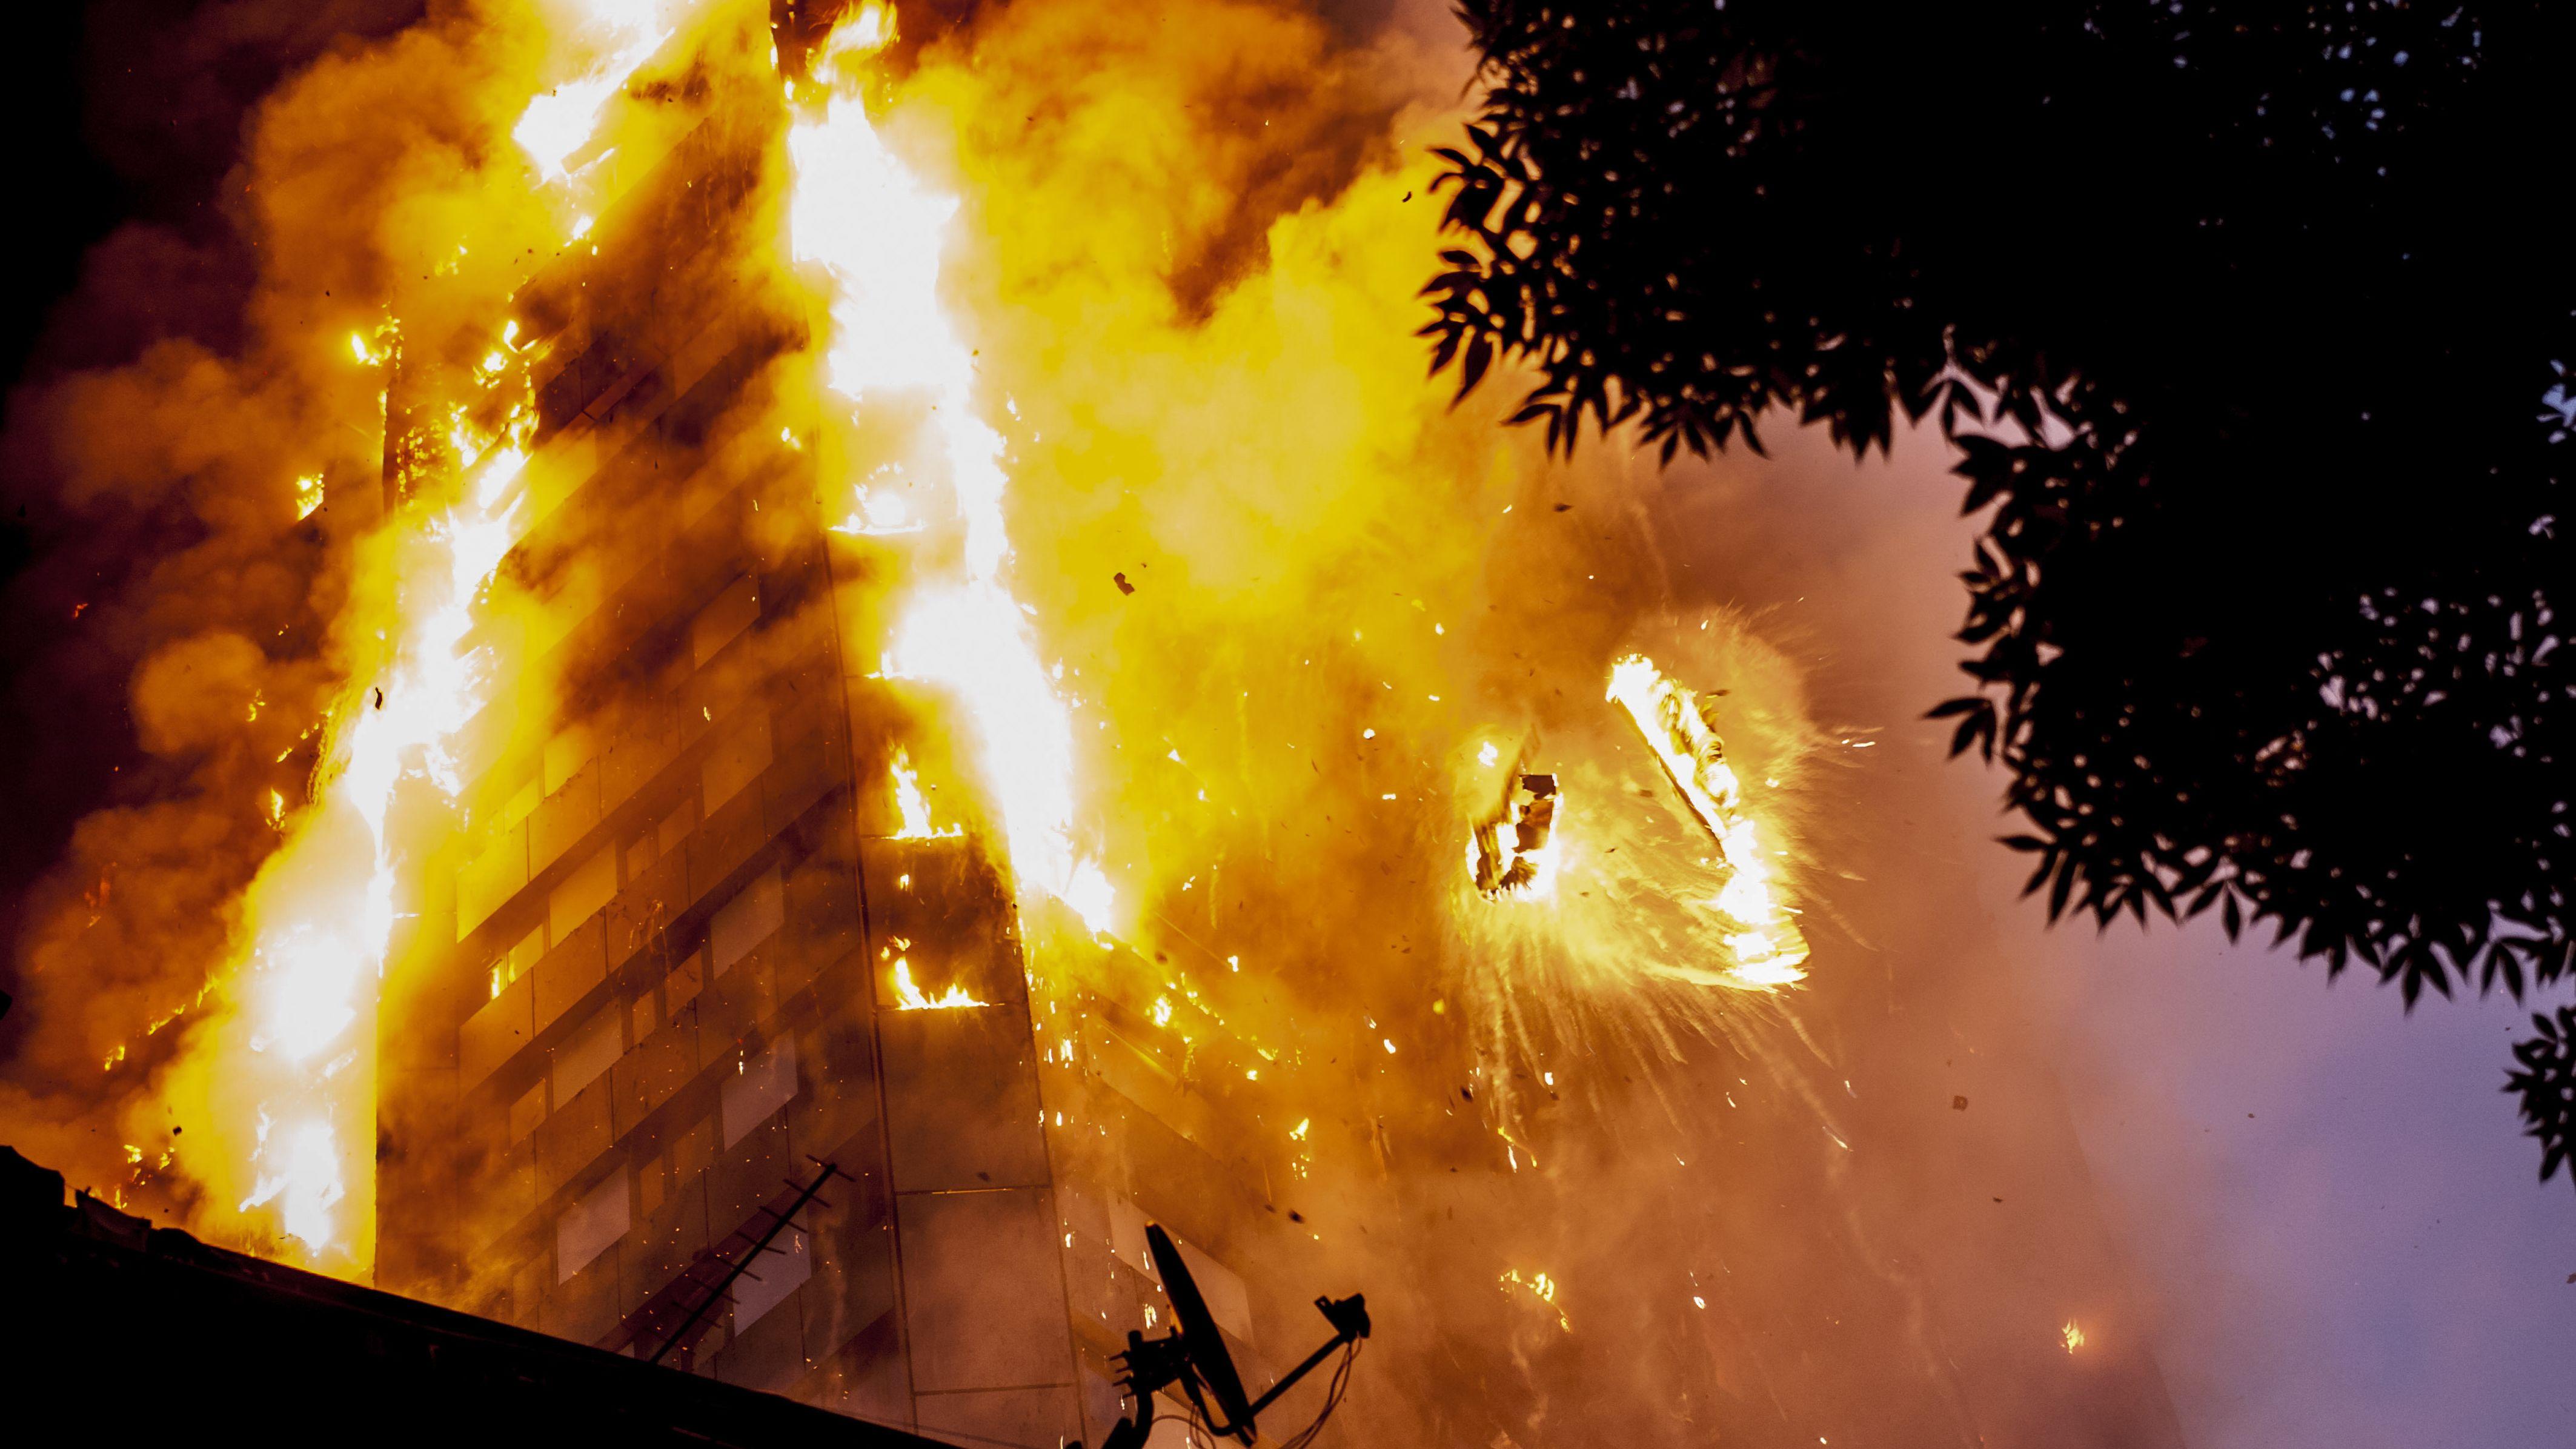 Der brennende Grenfell-Tower im Juni 2017